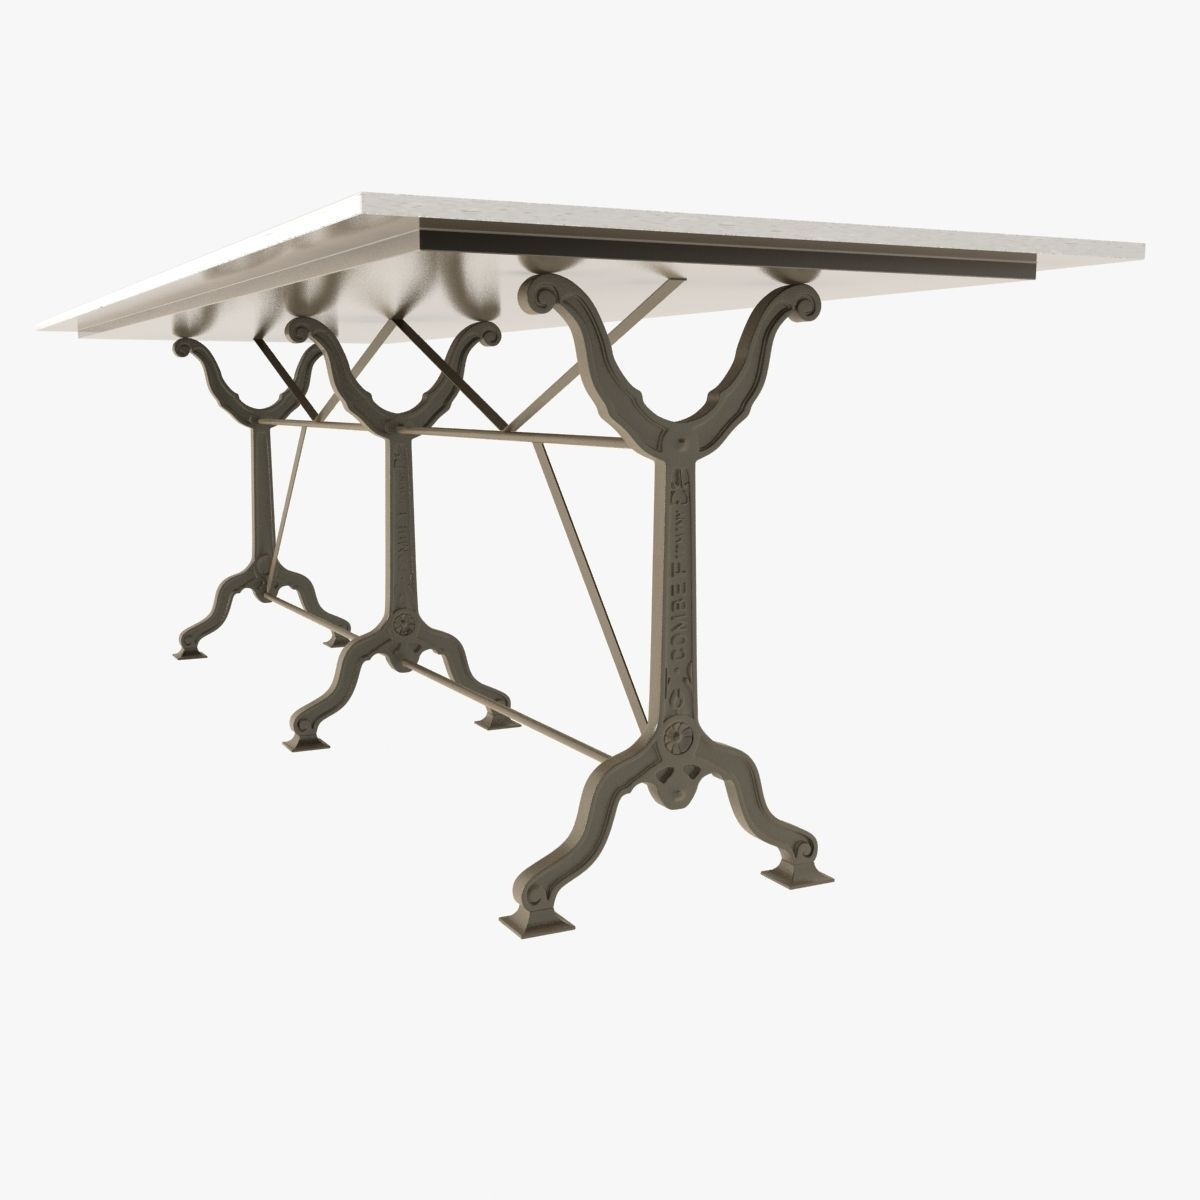 Restoration Hardware Factory Zinc Cast Iron Dining Tables 3d Model Max Obj  Fbx Mtl ...